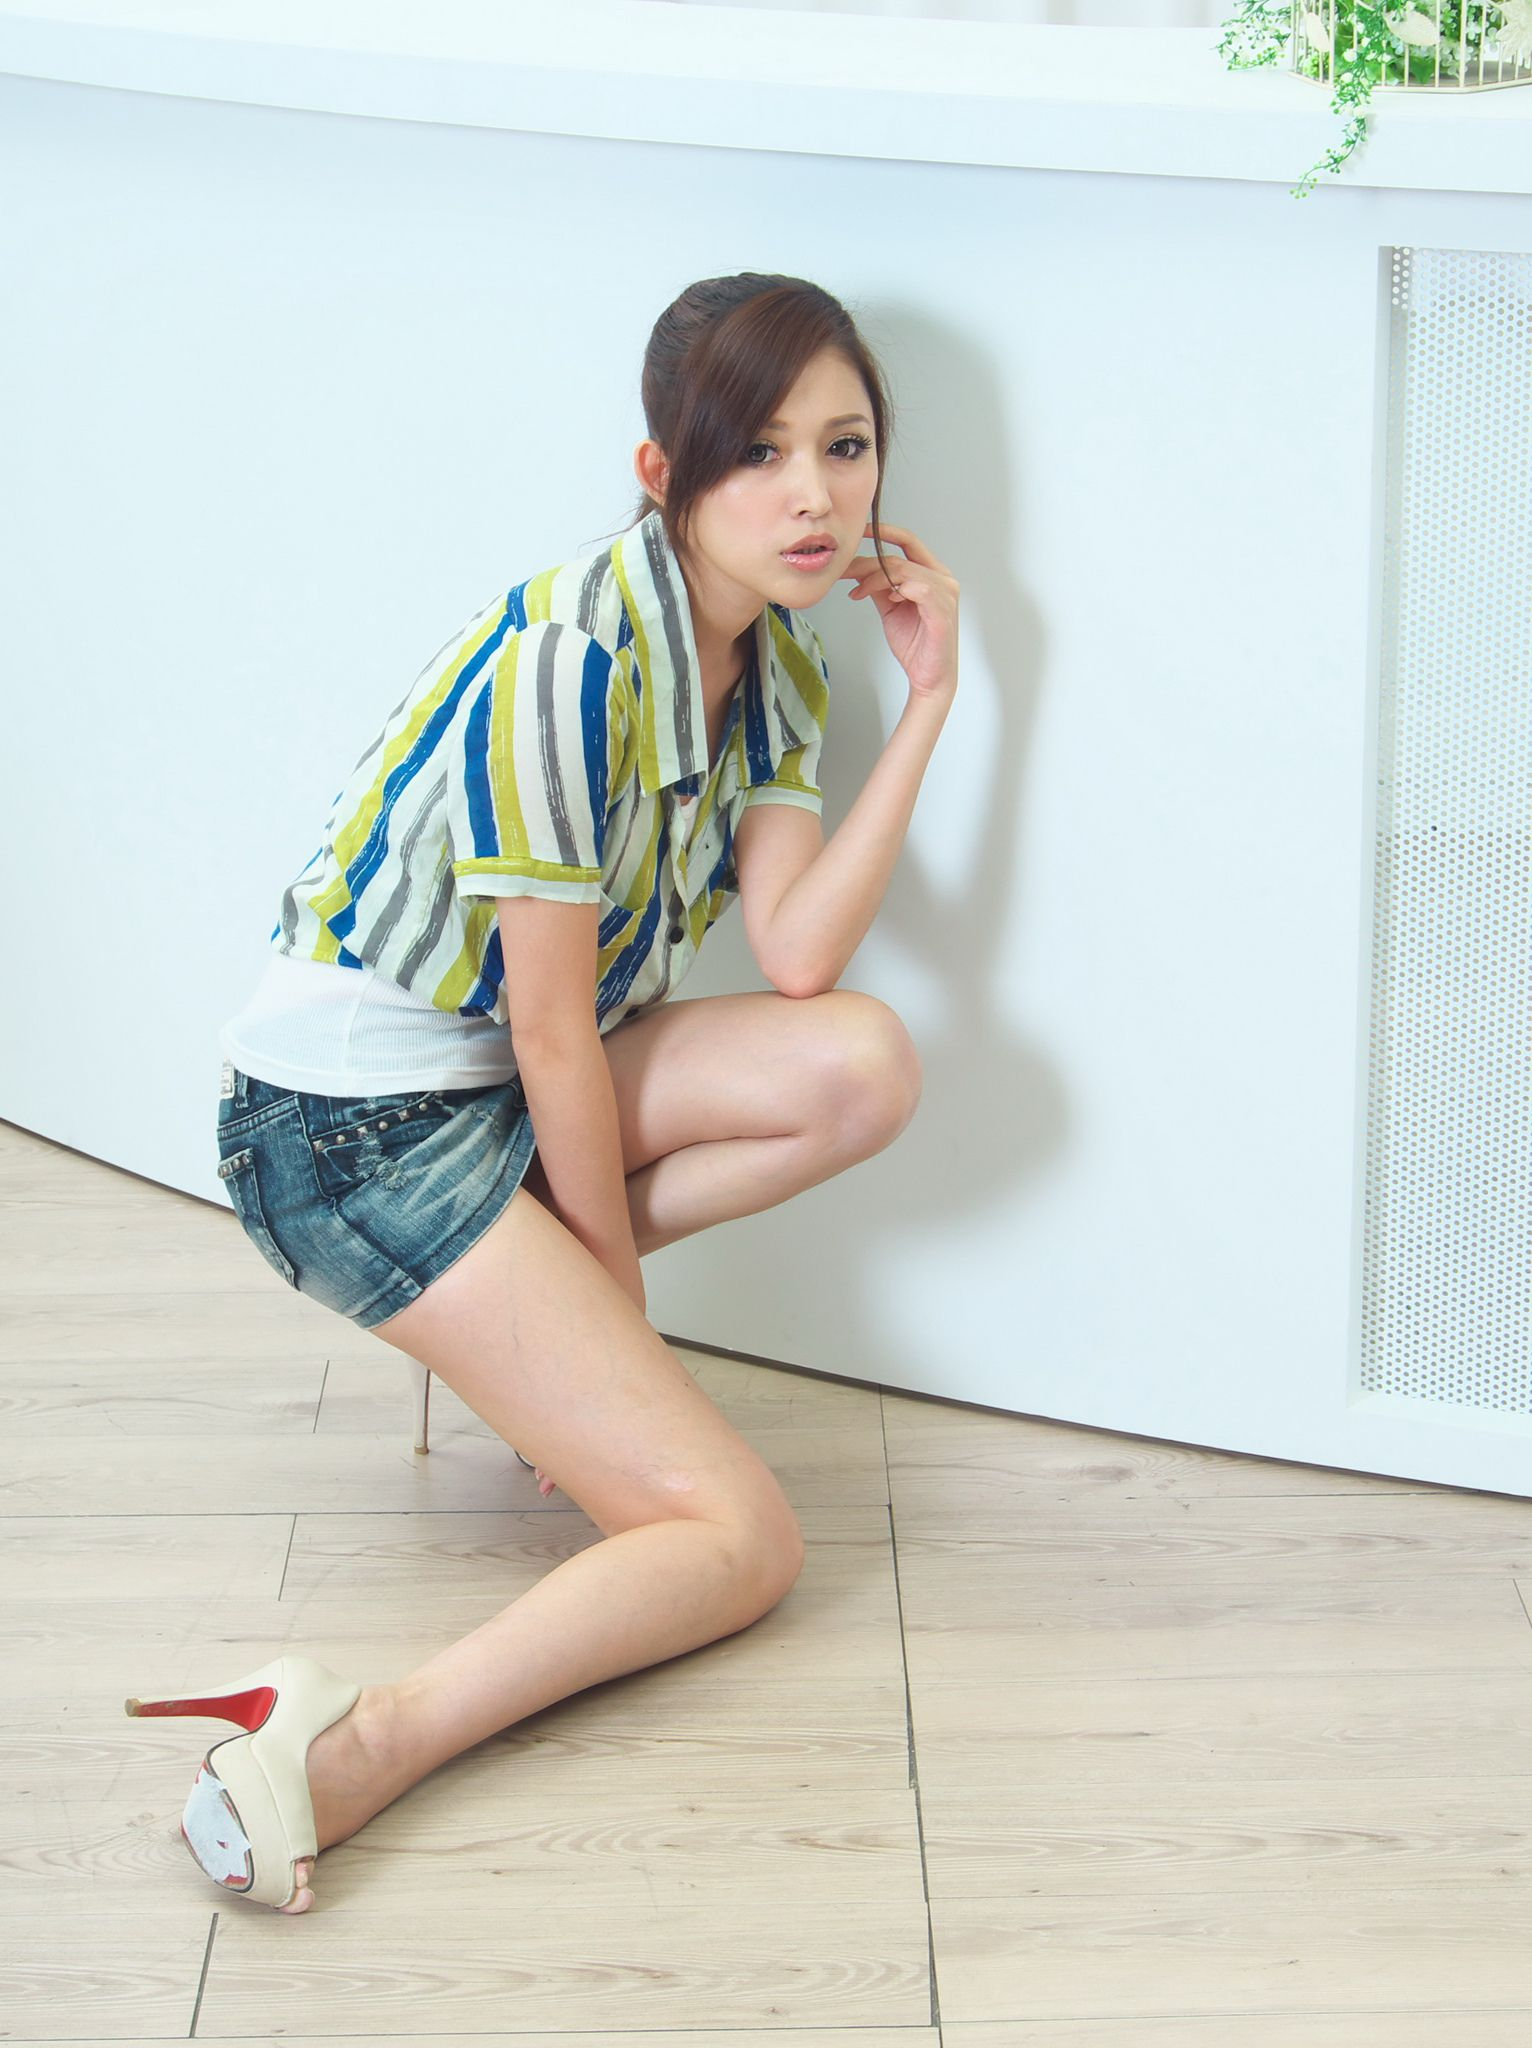 VOL.28 [网络美女]超短裙牛仔衬衫:杜可薇(腿模Avy,恬小鱼)高品质写真套图(34P)